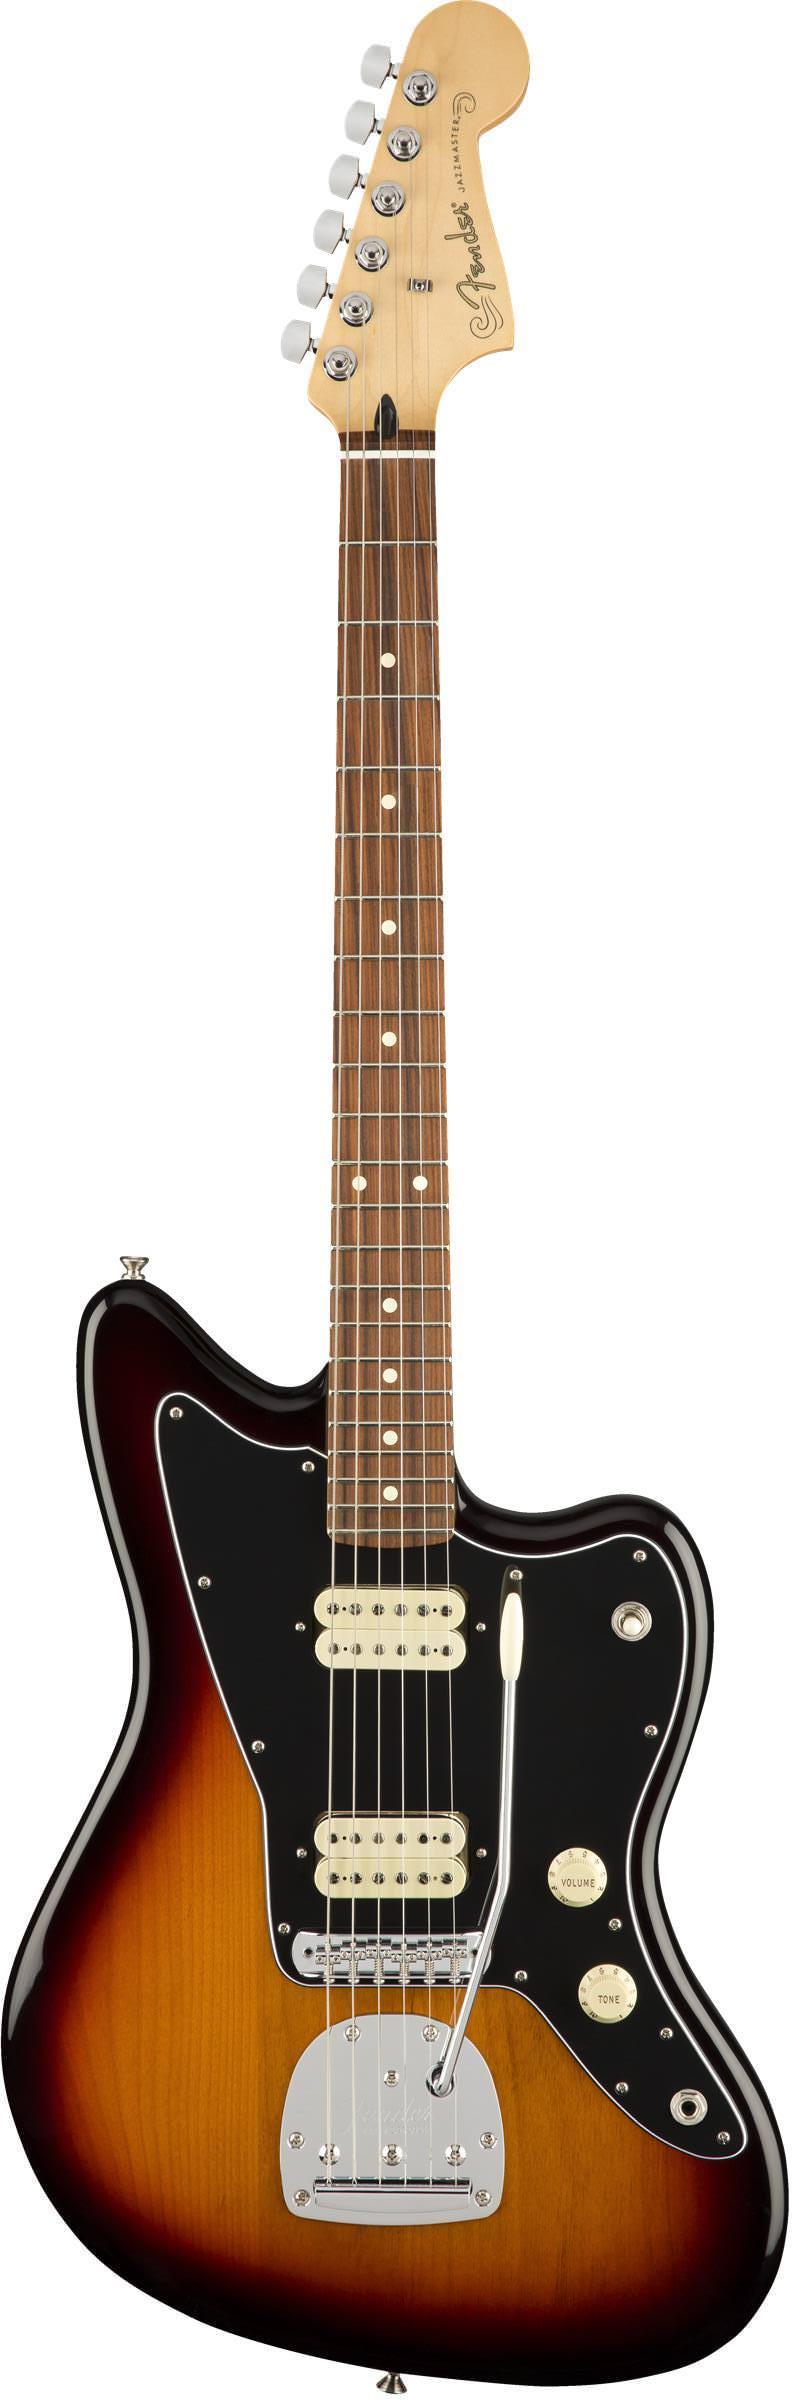 Электрогитара Fender Player Jazzmaster …